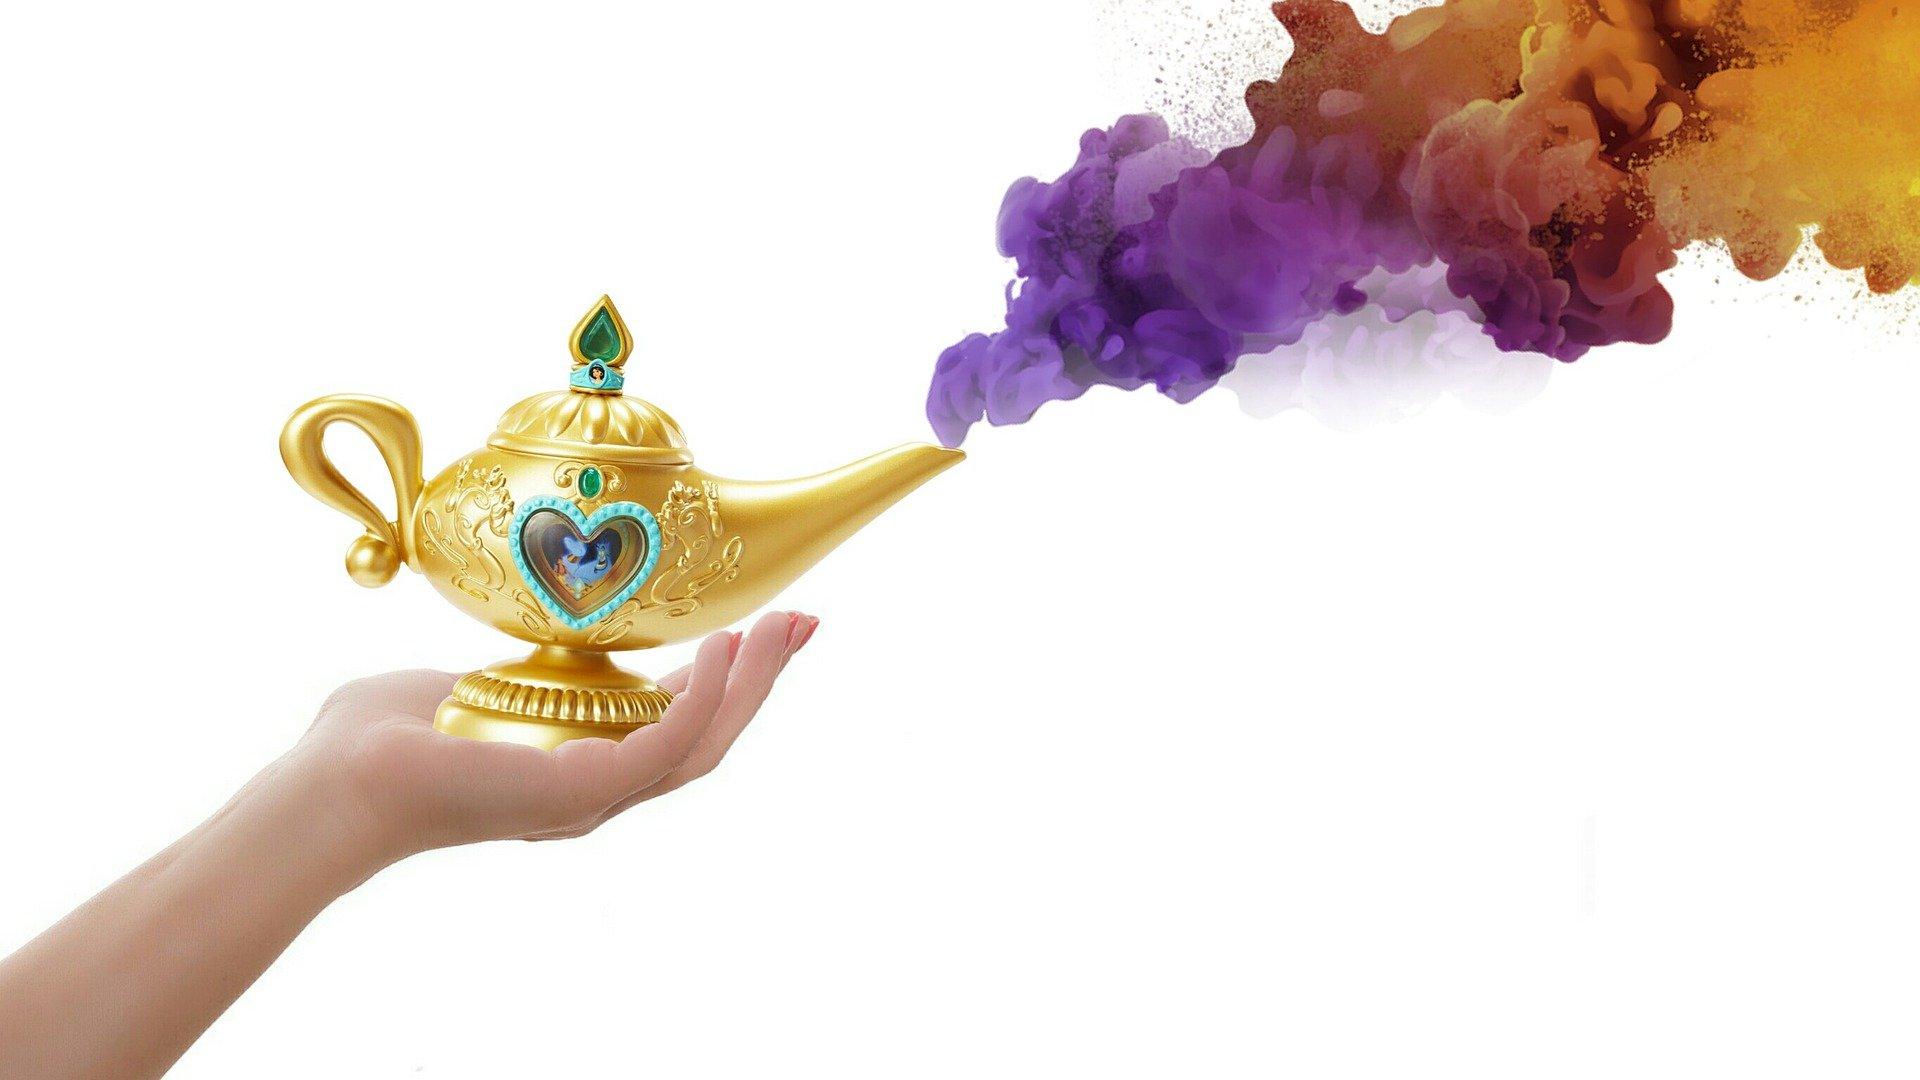 aromaterapia y espiritualidad